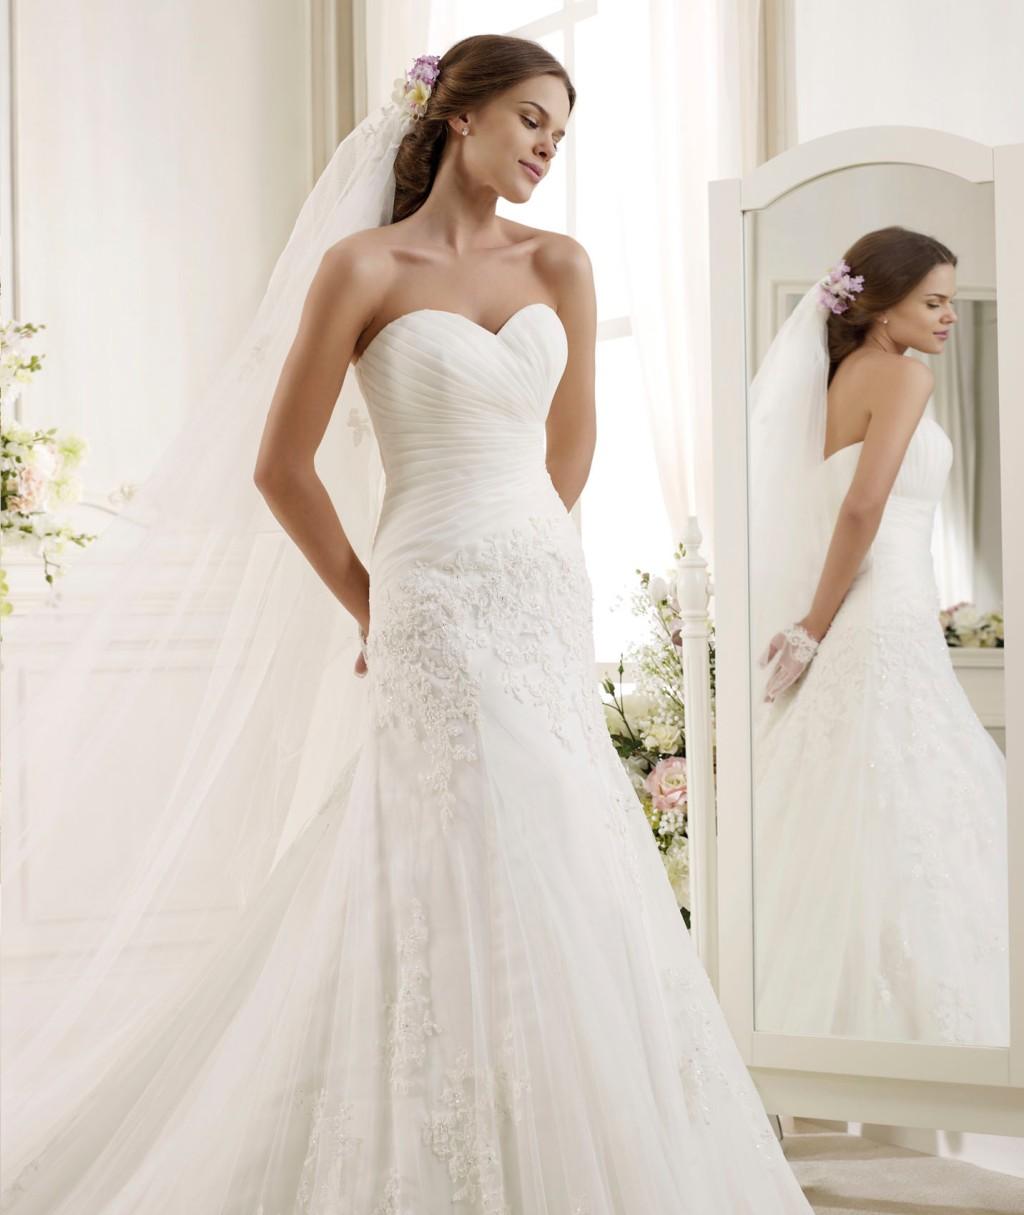 Colet Spose 2014 Spring Bridal Collection (VI)